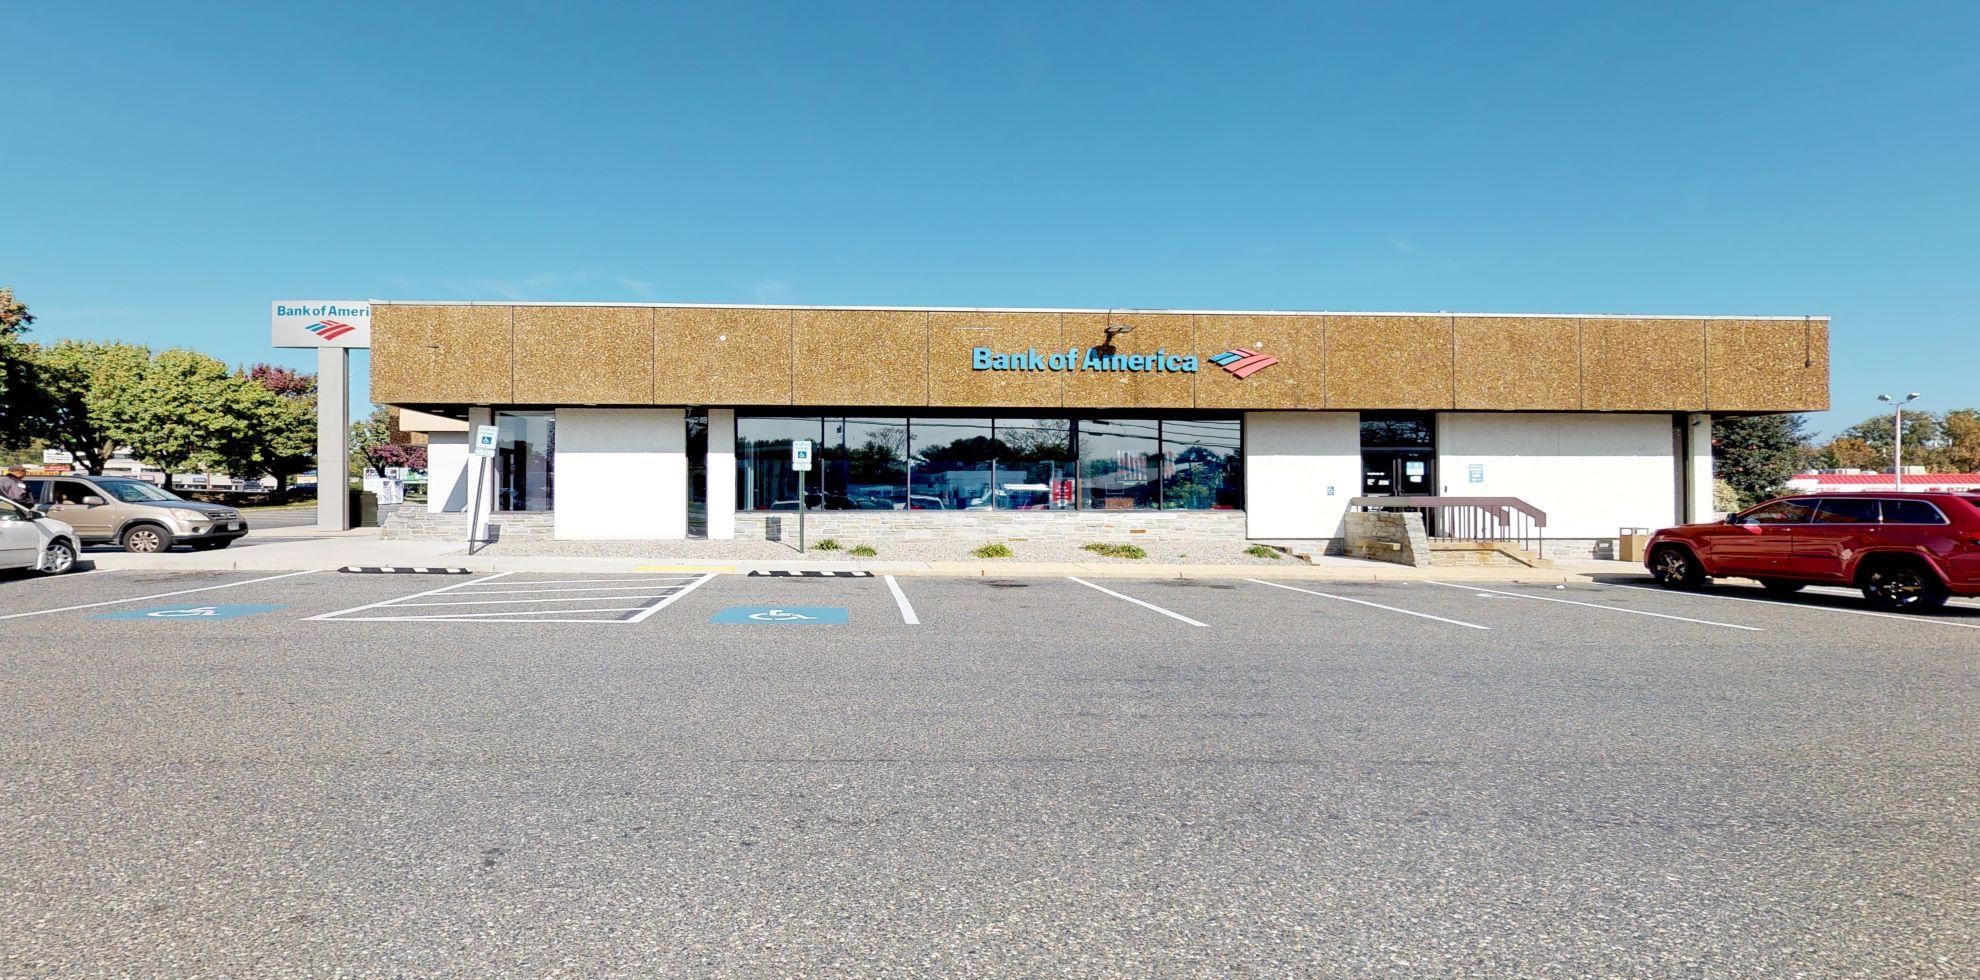 Bank of America financial center with drive-thru ATM | 350 Hospital Dr, Glen Burnie, MD 21061